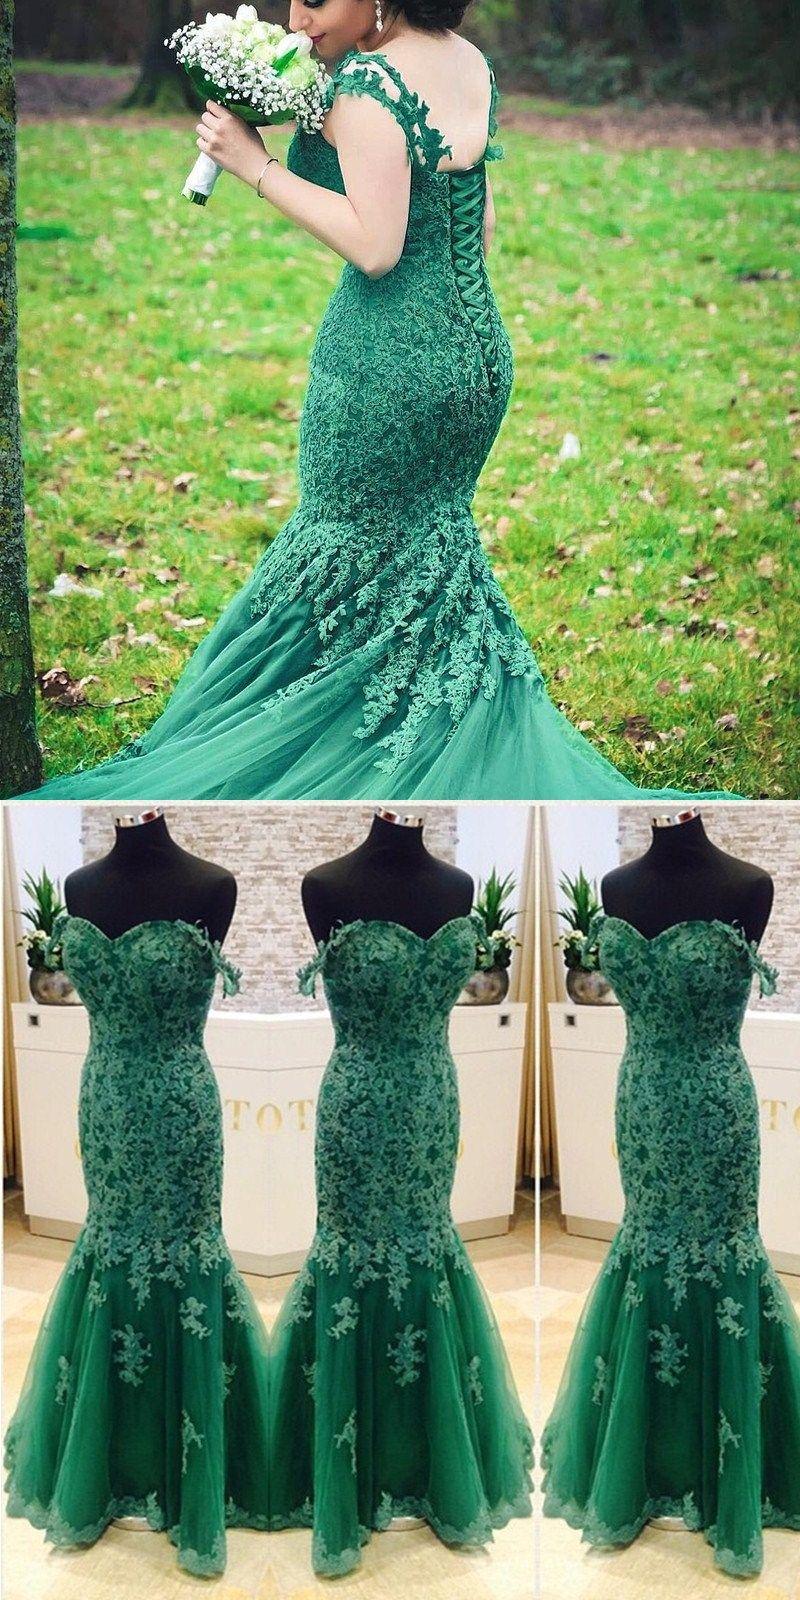 Prom dressevening dressformal gownmermaid prom dress longgreen